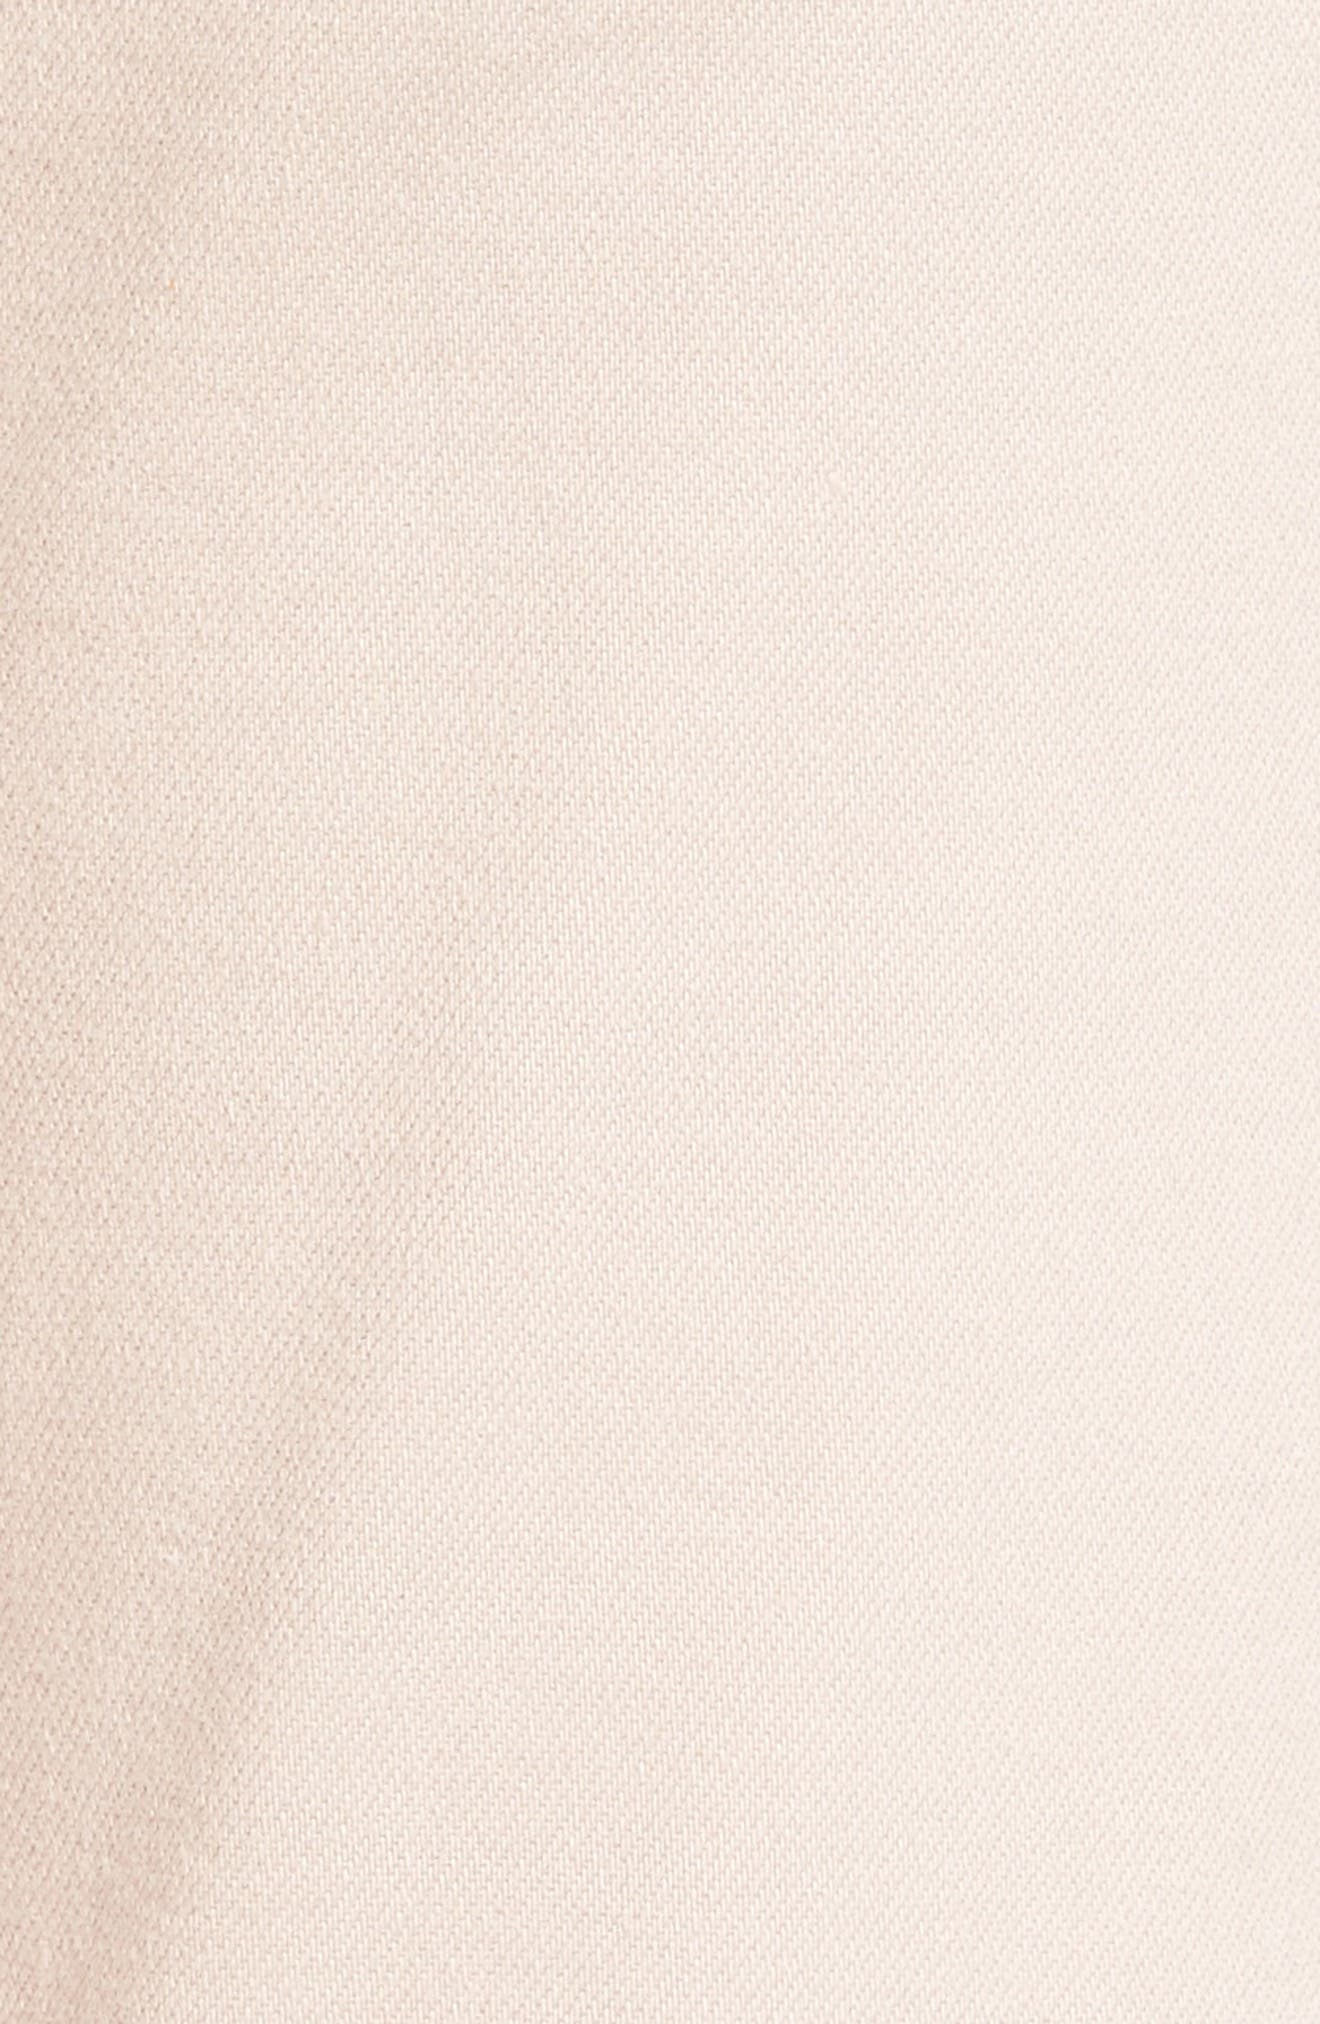 Amy Stretch Slim Crop Jeans,                             Alternate thumbnail 5, color,                             654